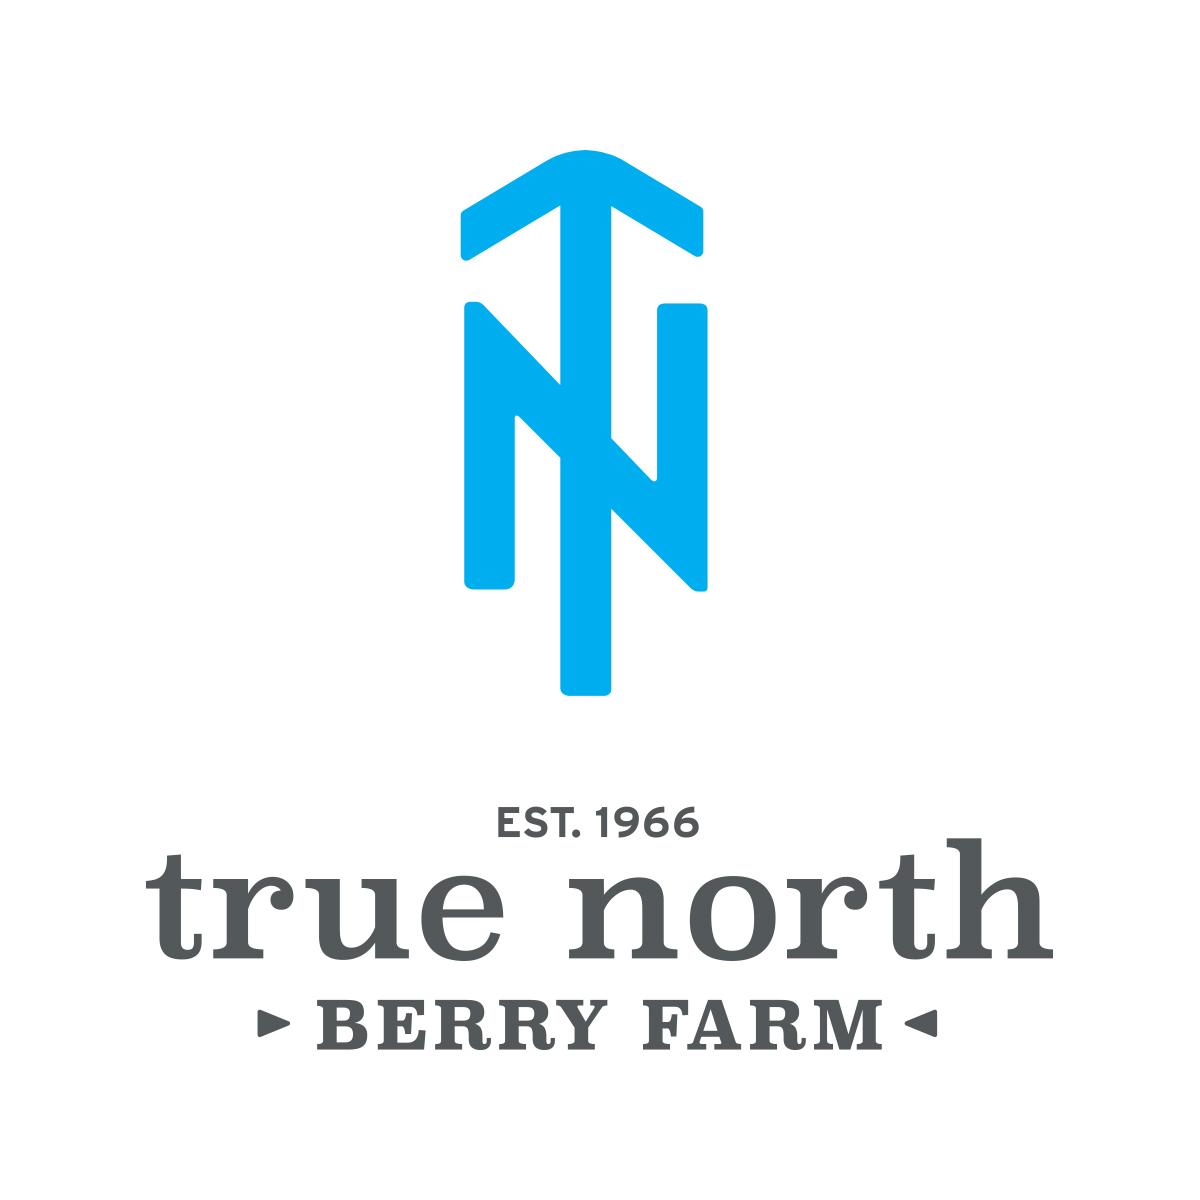 TrueNorthBerryFarm_logo_2colorRGB.jpg